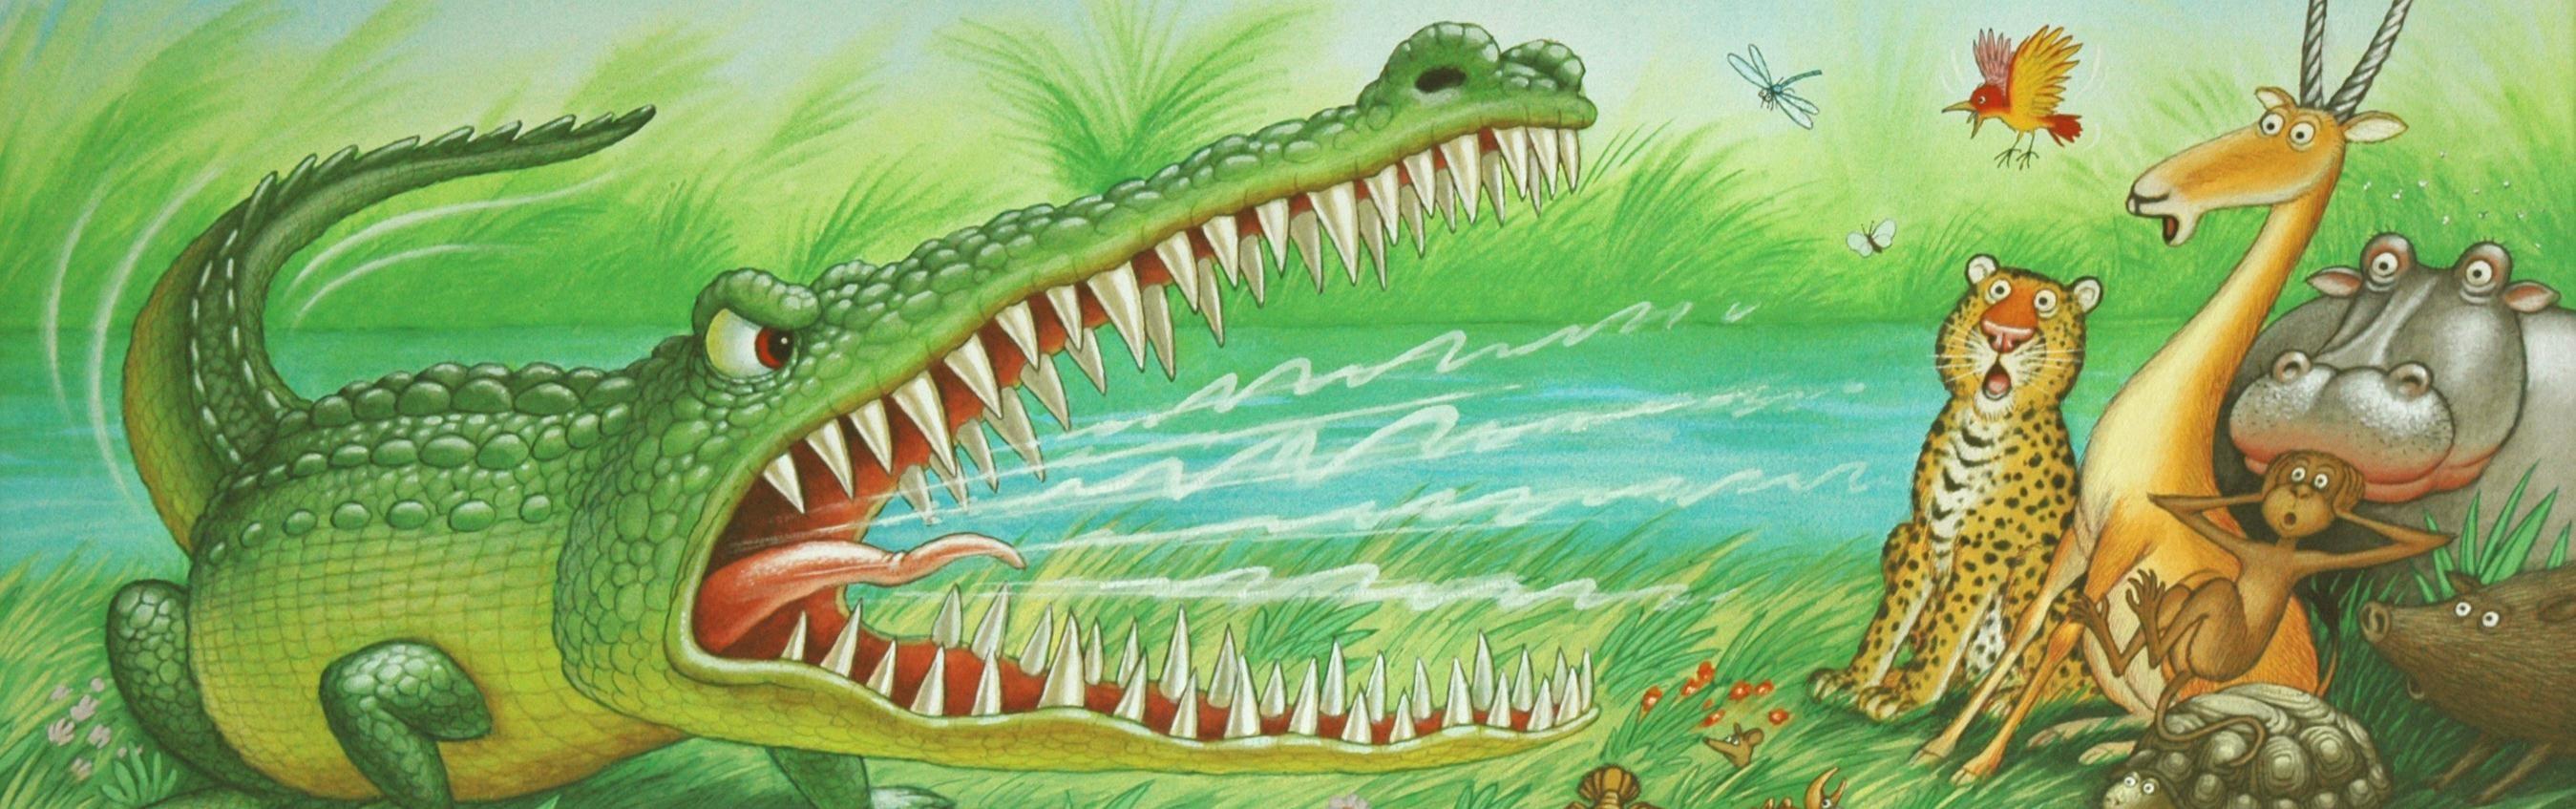 Illustration From The Selfish Crocodile